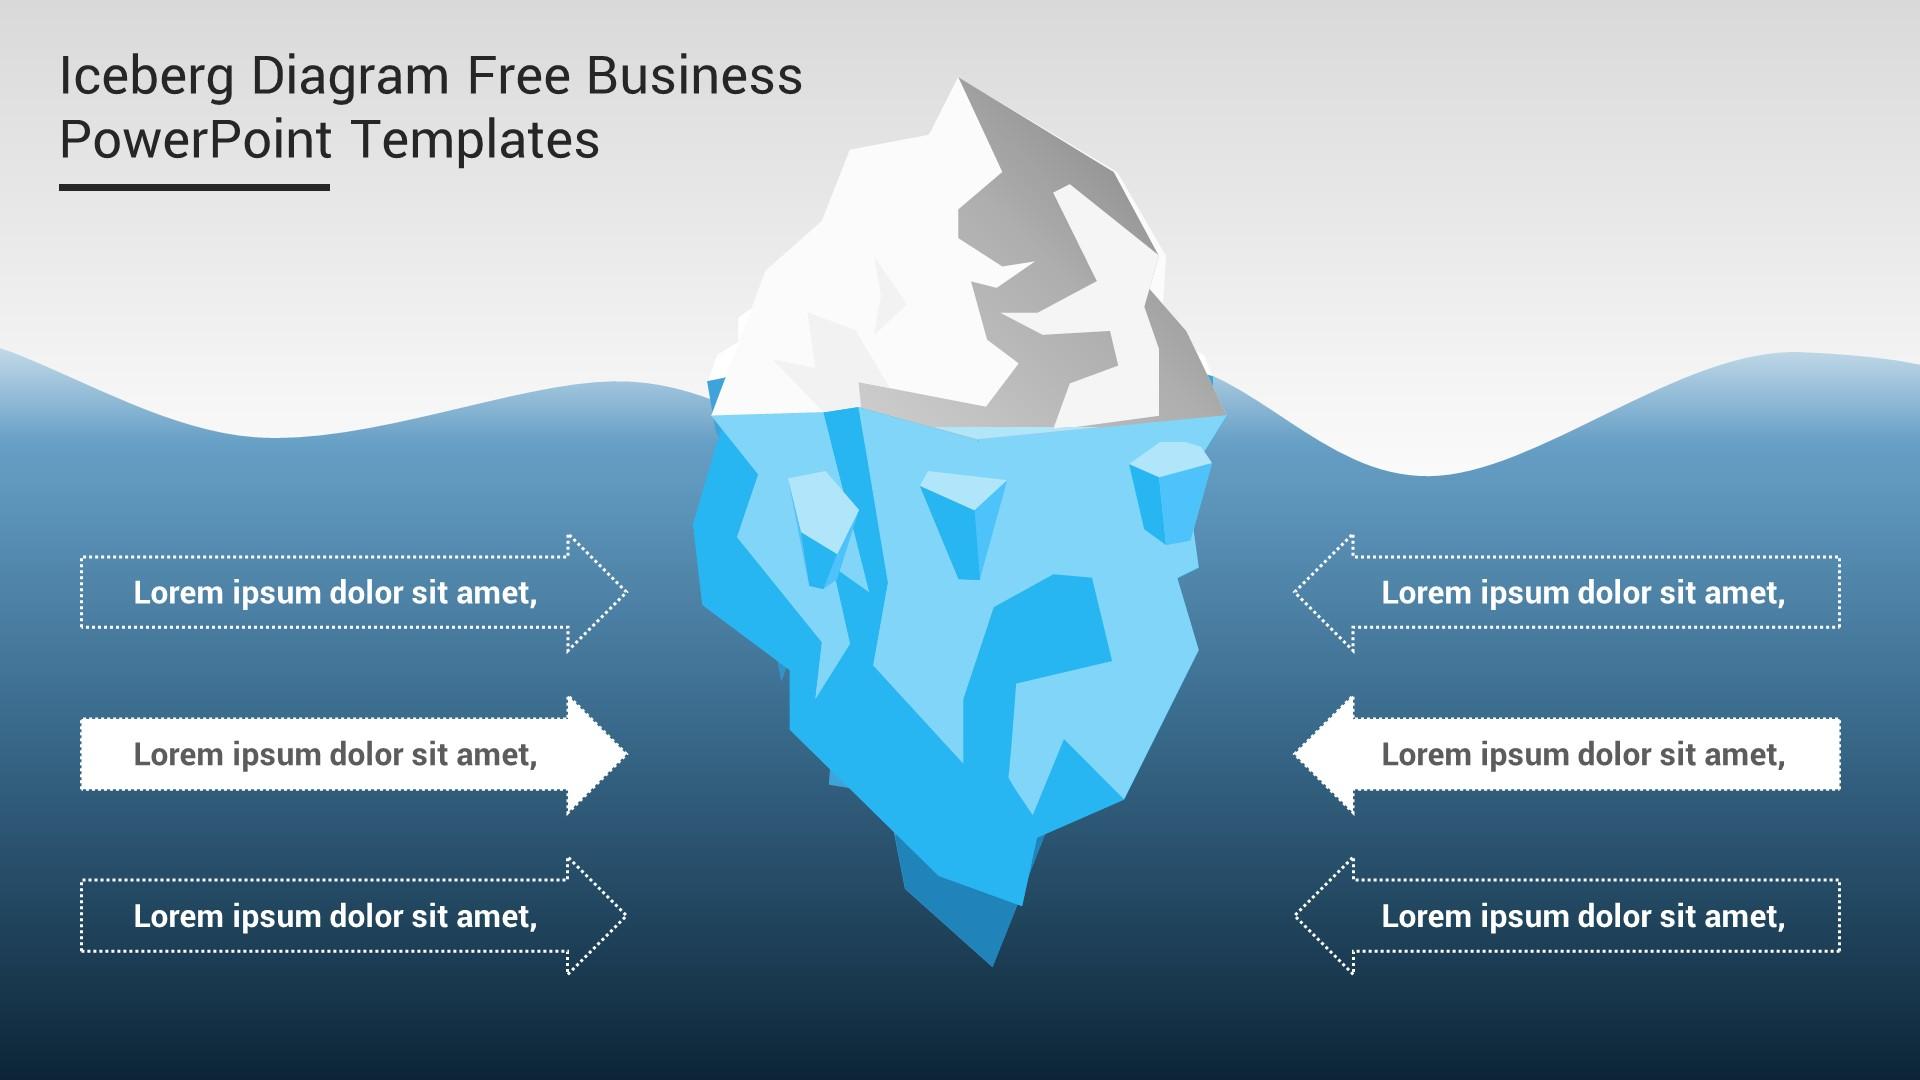 Iceberg Diagram Free Business PowerPoint Templates